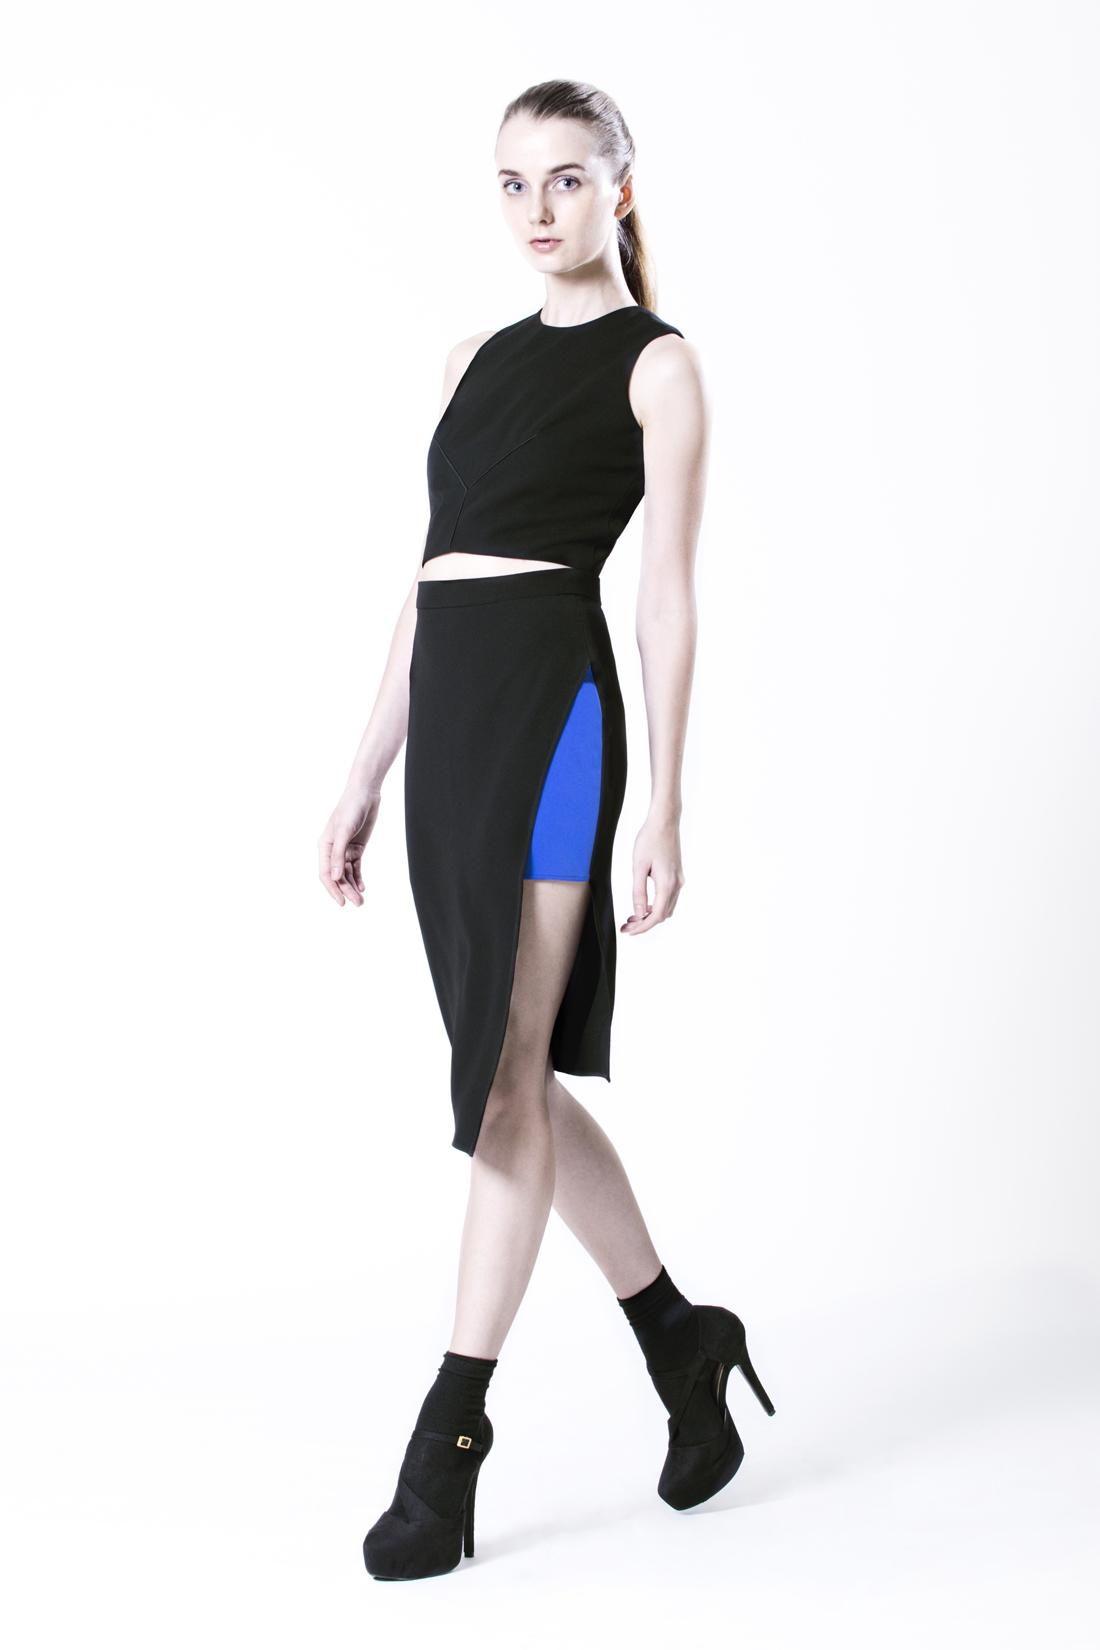 sr-darla crop top and chantal skirt.jpg